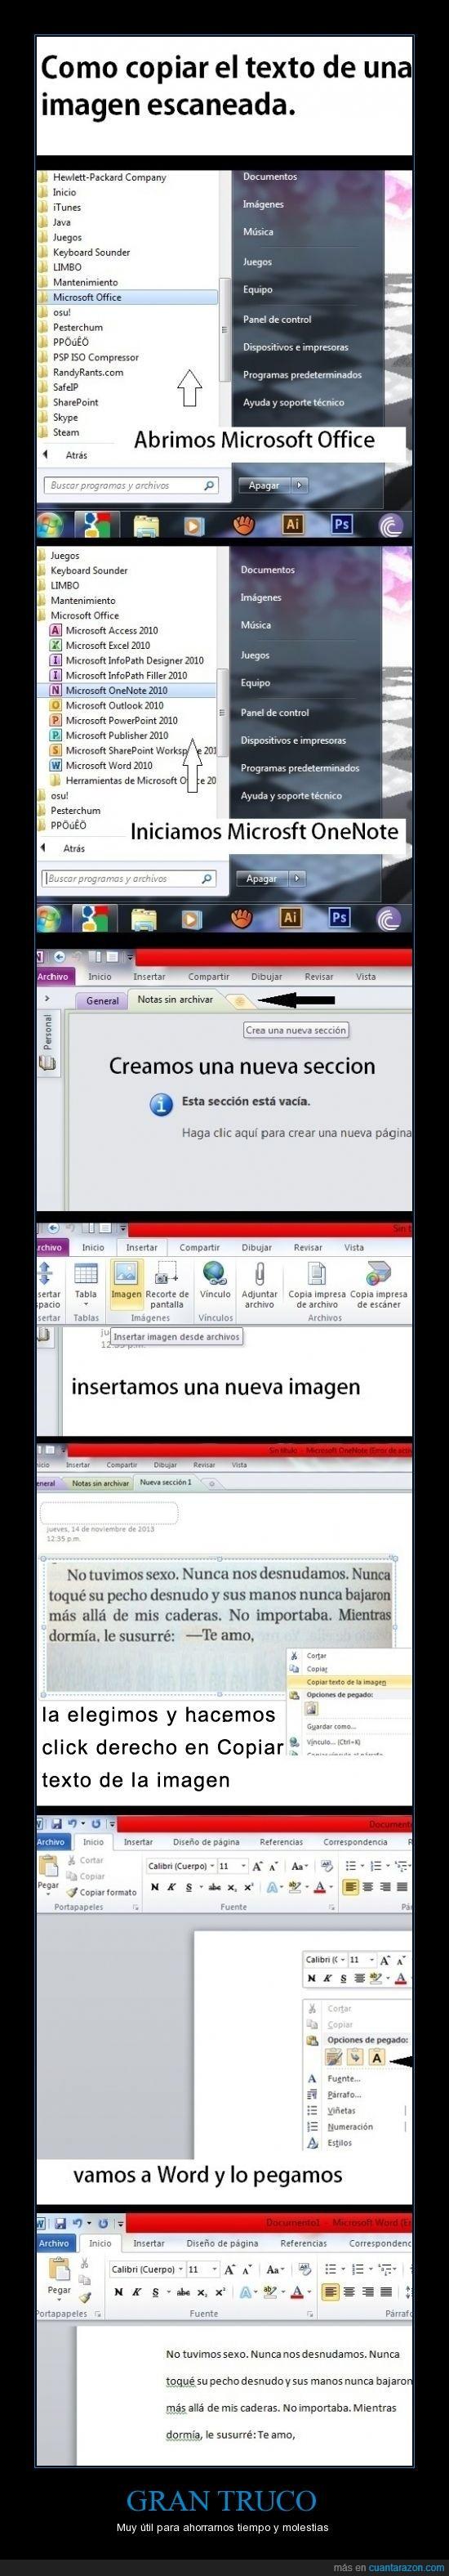 copiar texto,imagen,microsoft,one note,truco,word